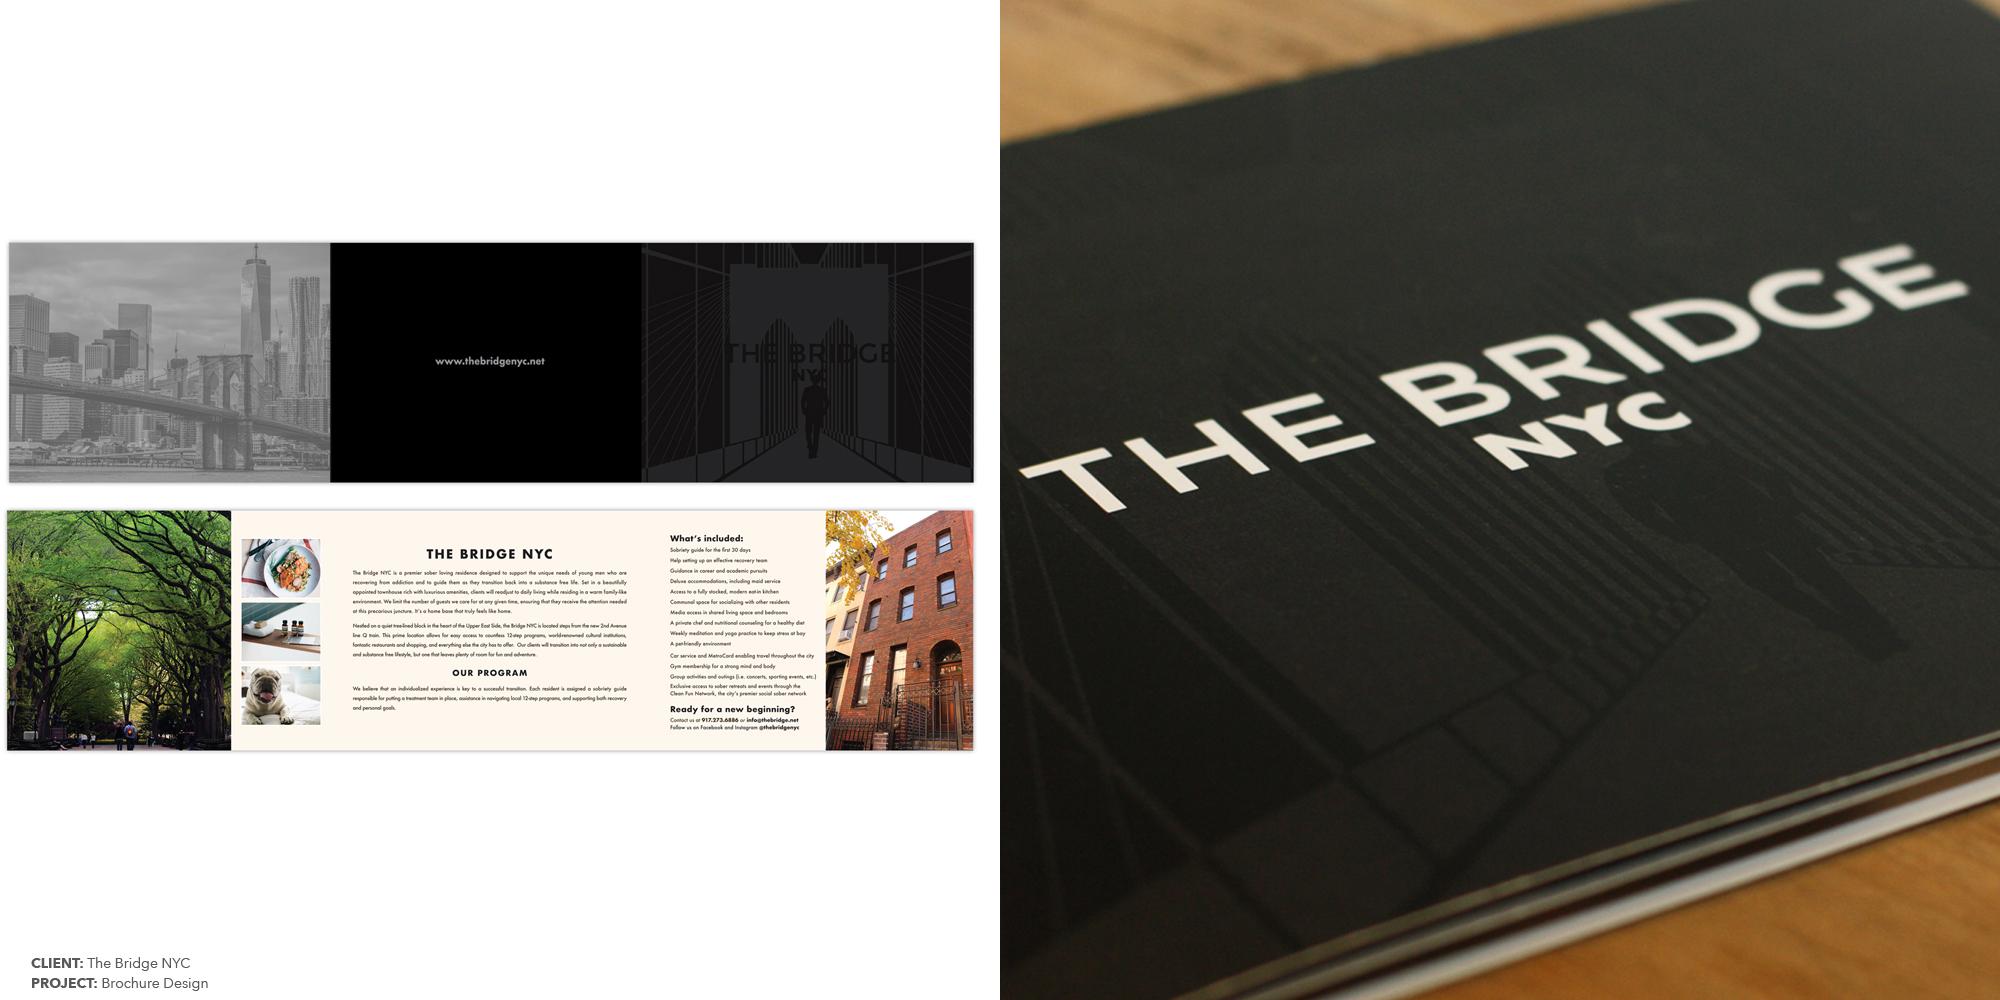 MARKETING BROCHURE  CLIENT:  THE BRIDGE NYC  Design & Production Copywriter: Jenn Kantor